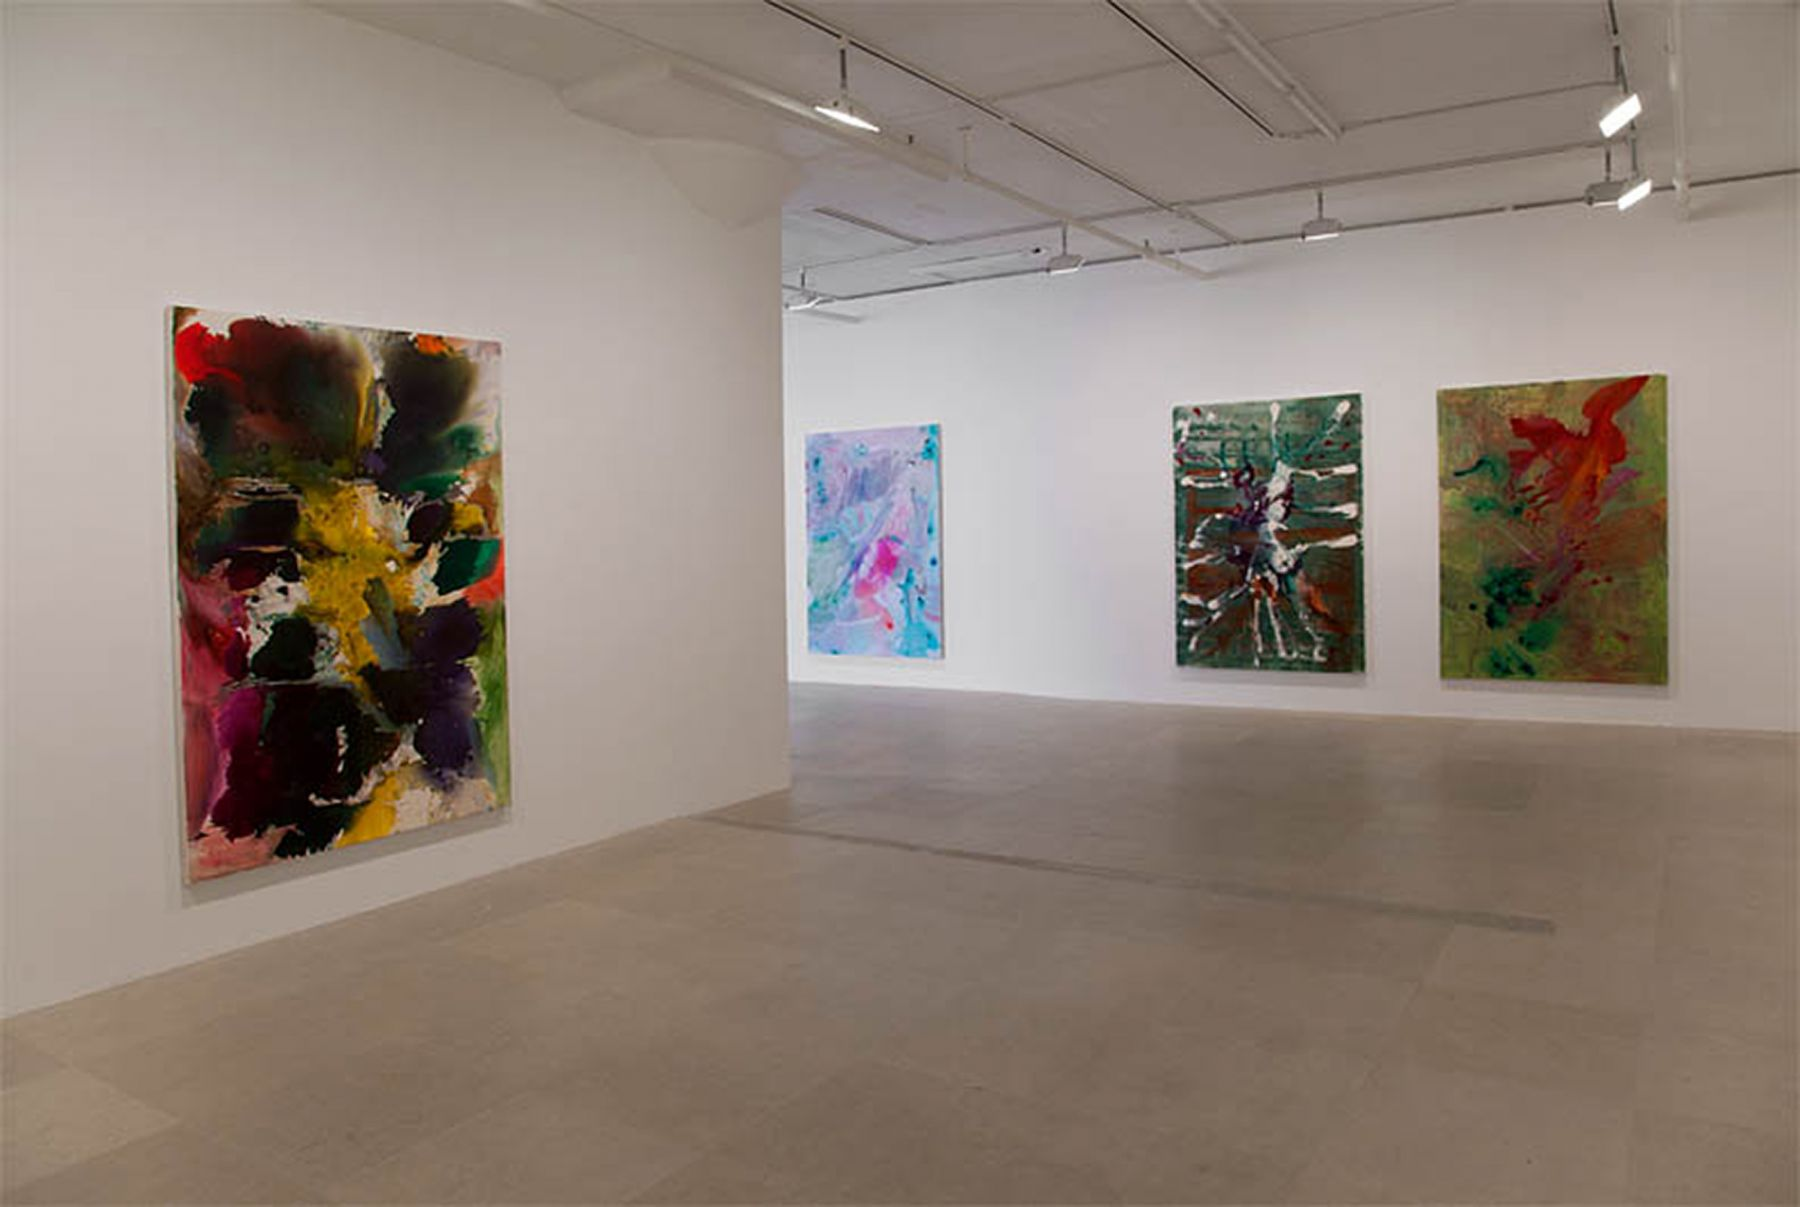 Installation view, Greene Naftali, New York, 2011